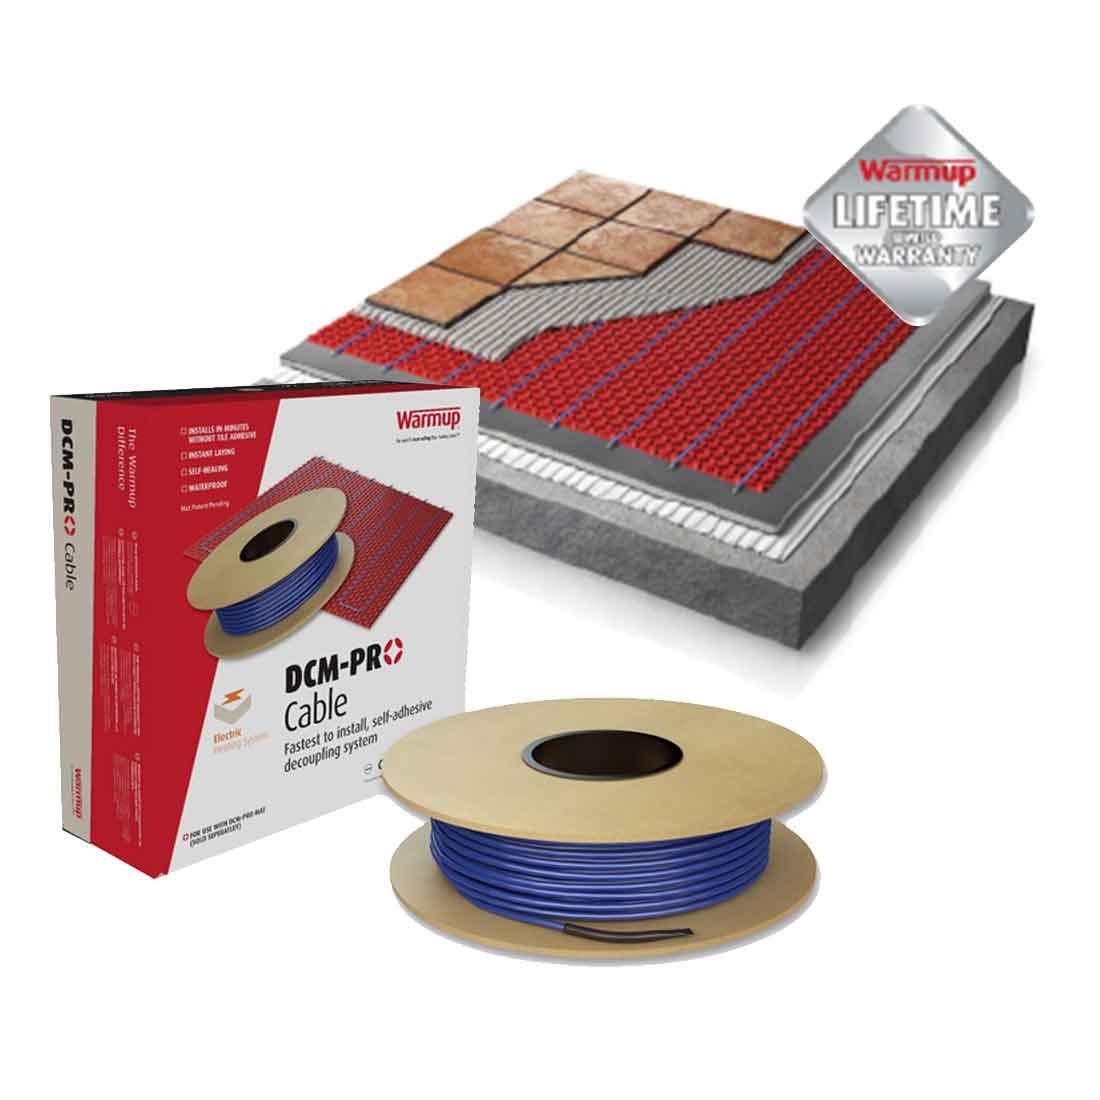 Warmup Electric Underfloor Heating Trading Depot Joy Long Van Electrical Fuse Box Dcm Pro